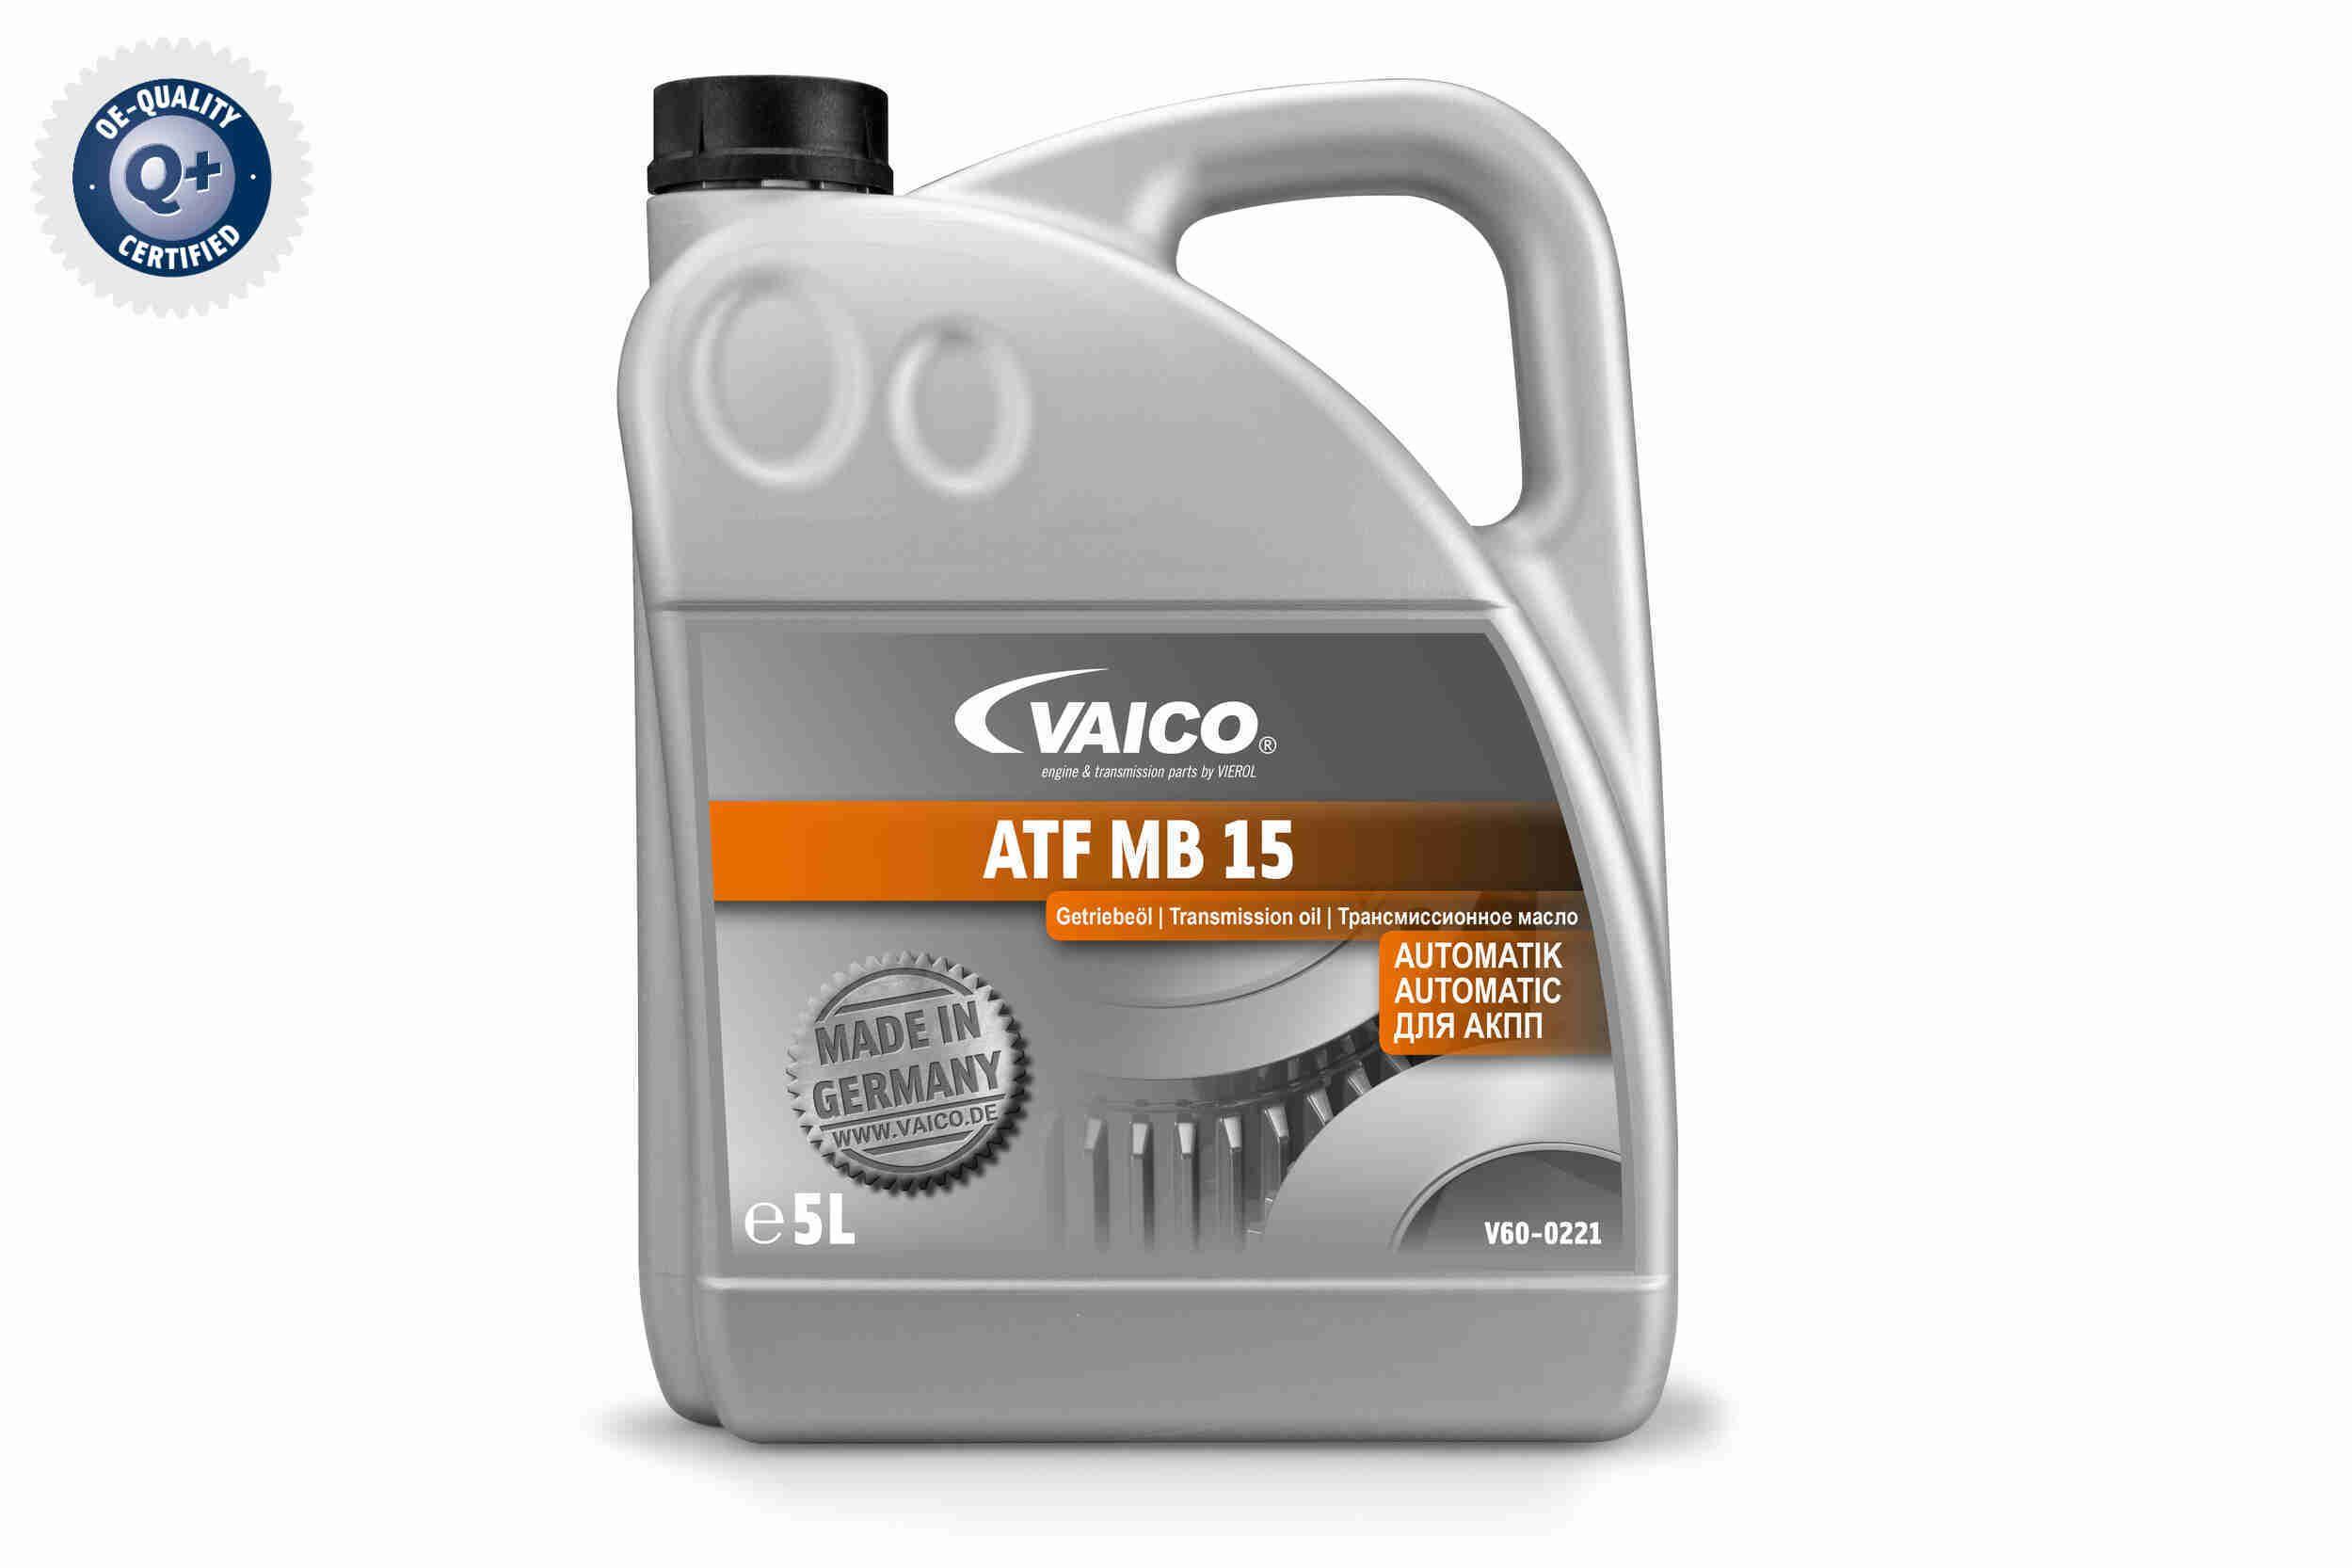 V60-0221 Automatikgetriebeöl VAICO Erfahrung